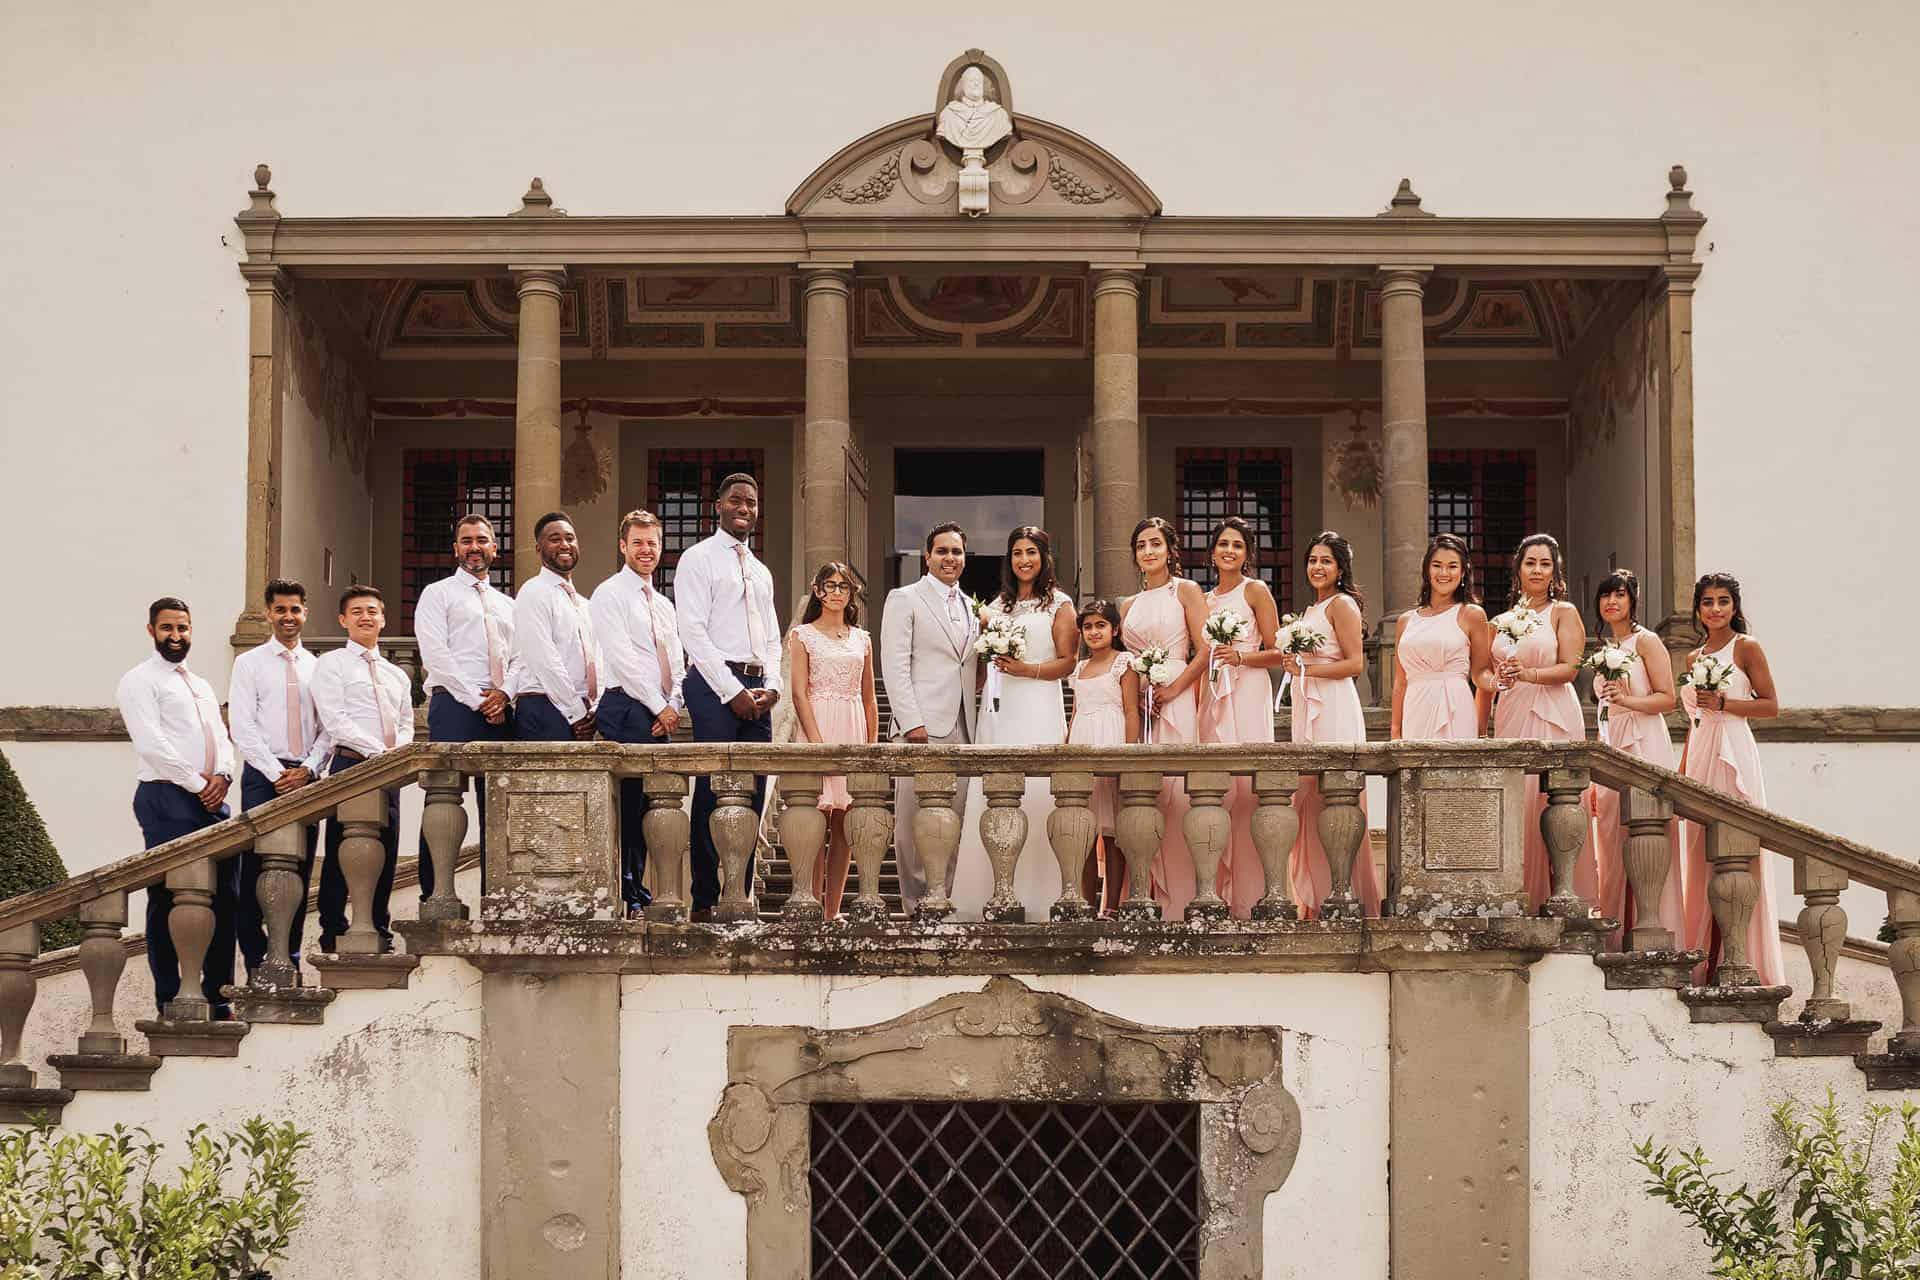 tenuta di artimino wedding photography